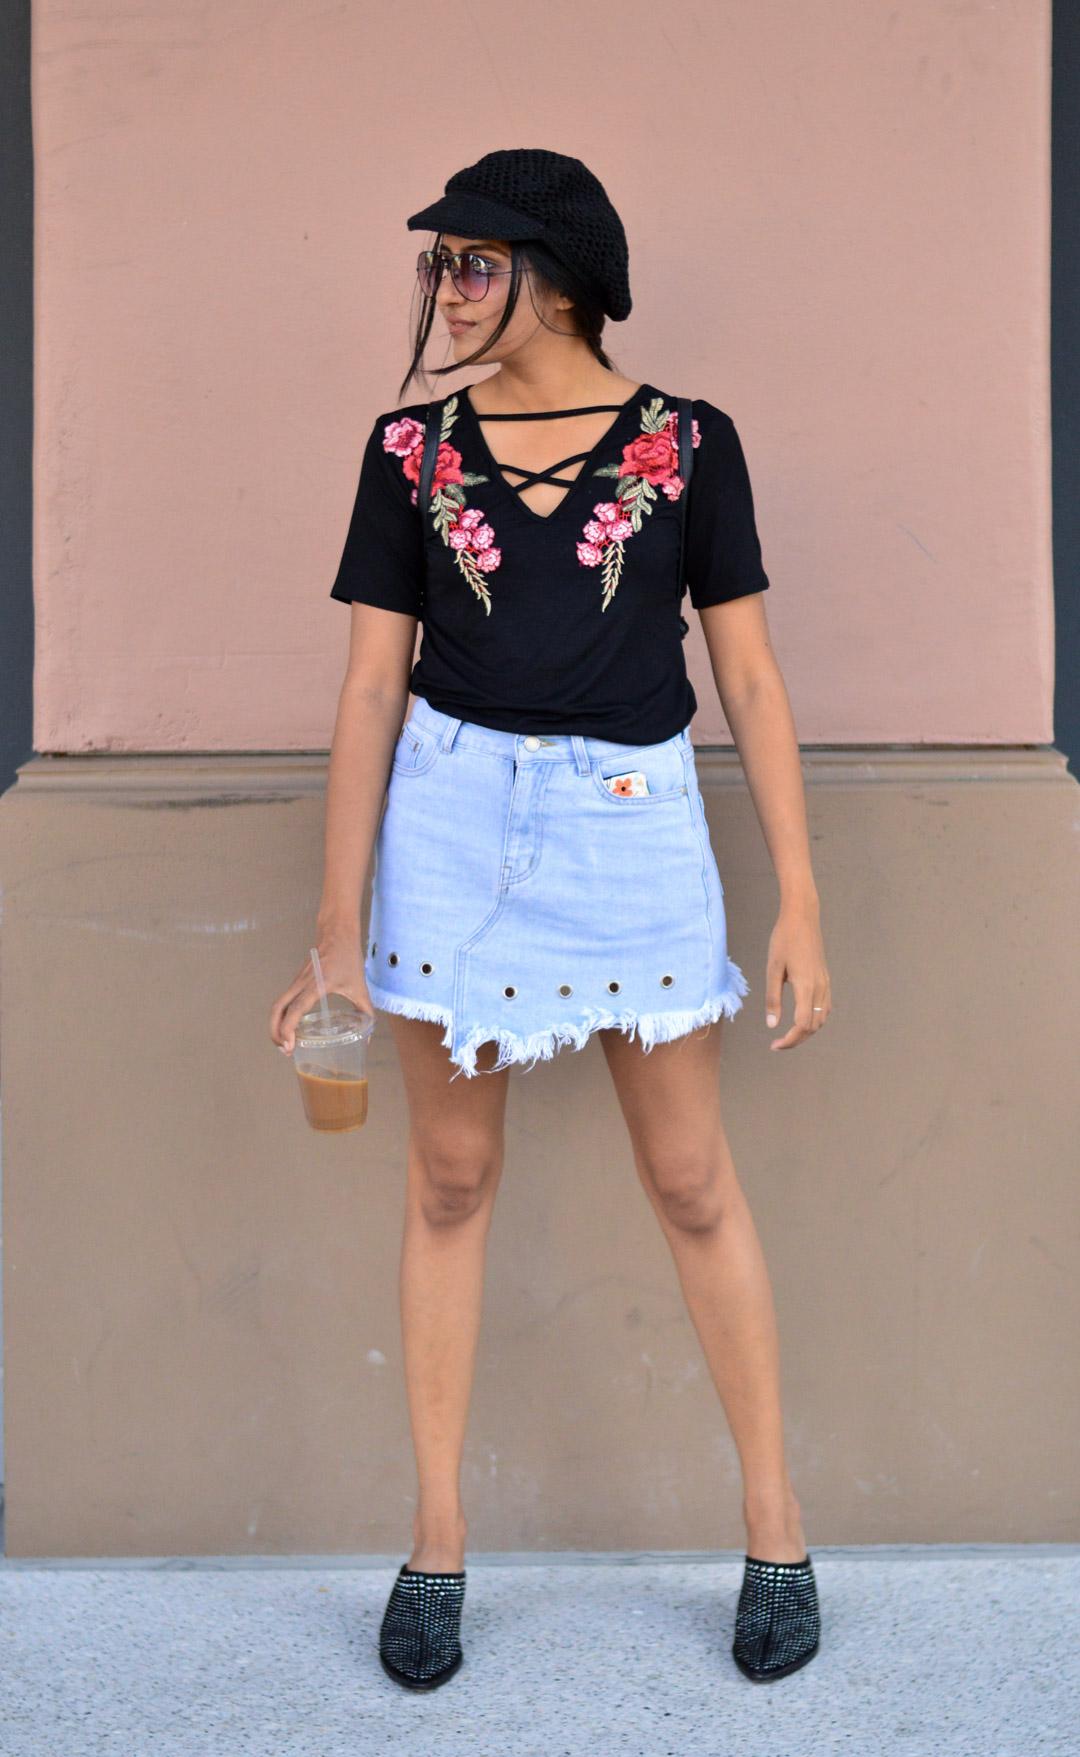 Casual-friday-style-denim-skirt-black-tee-studded-booties 4